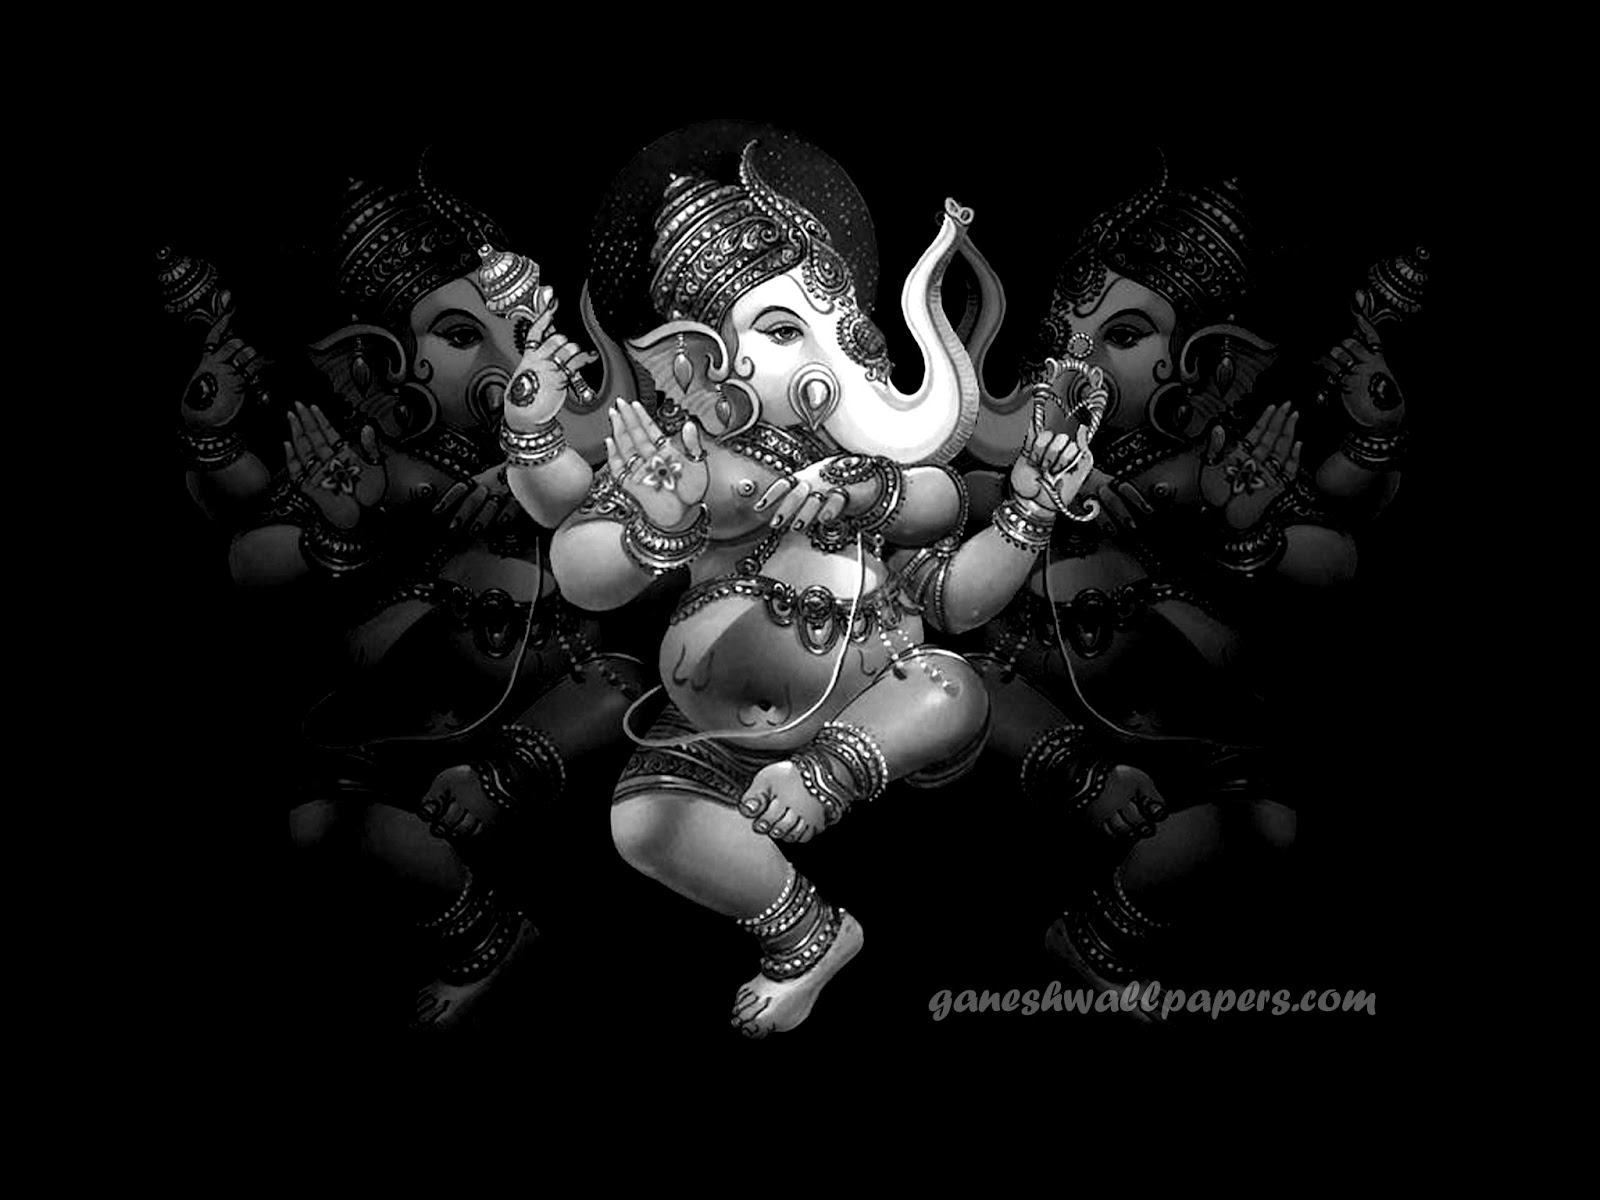 Ganesh Wallpaper Blog: Ganesh Wallpaper High Resolution